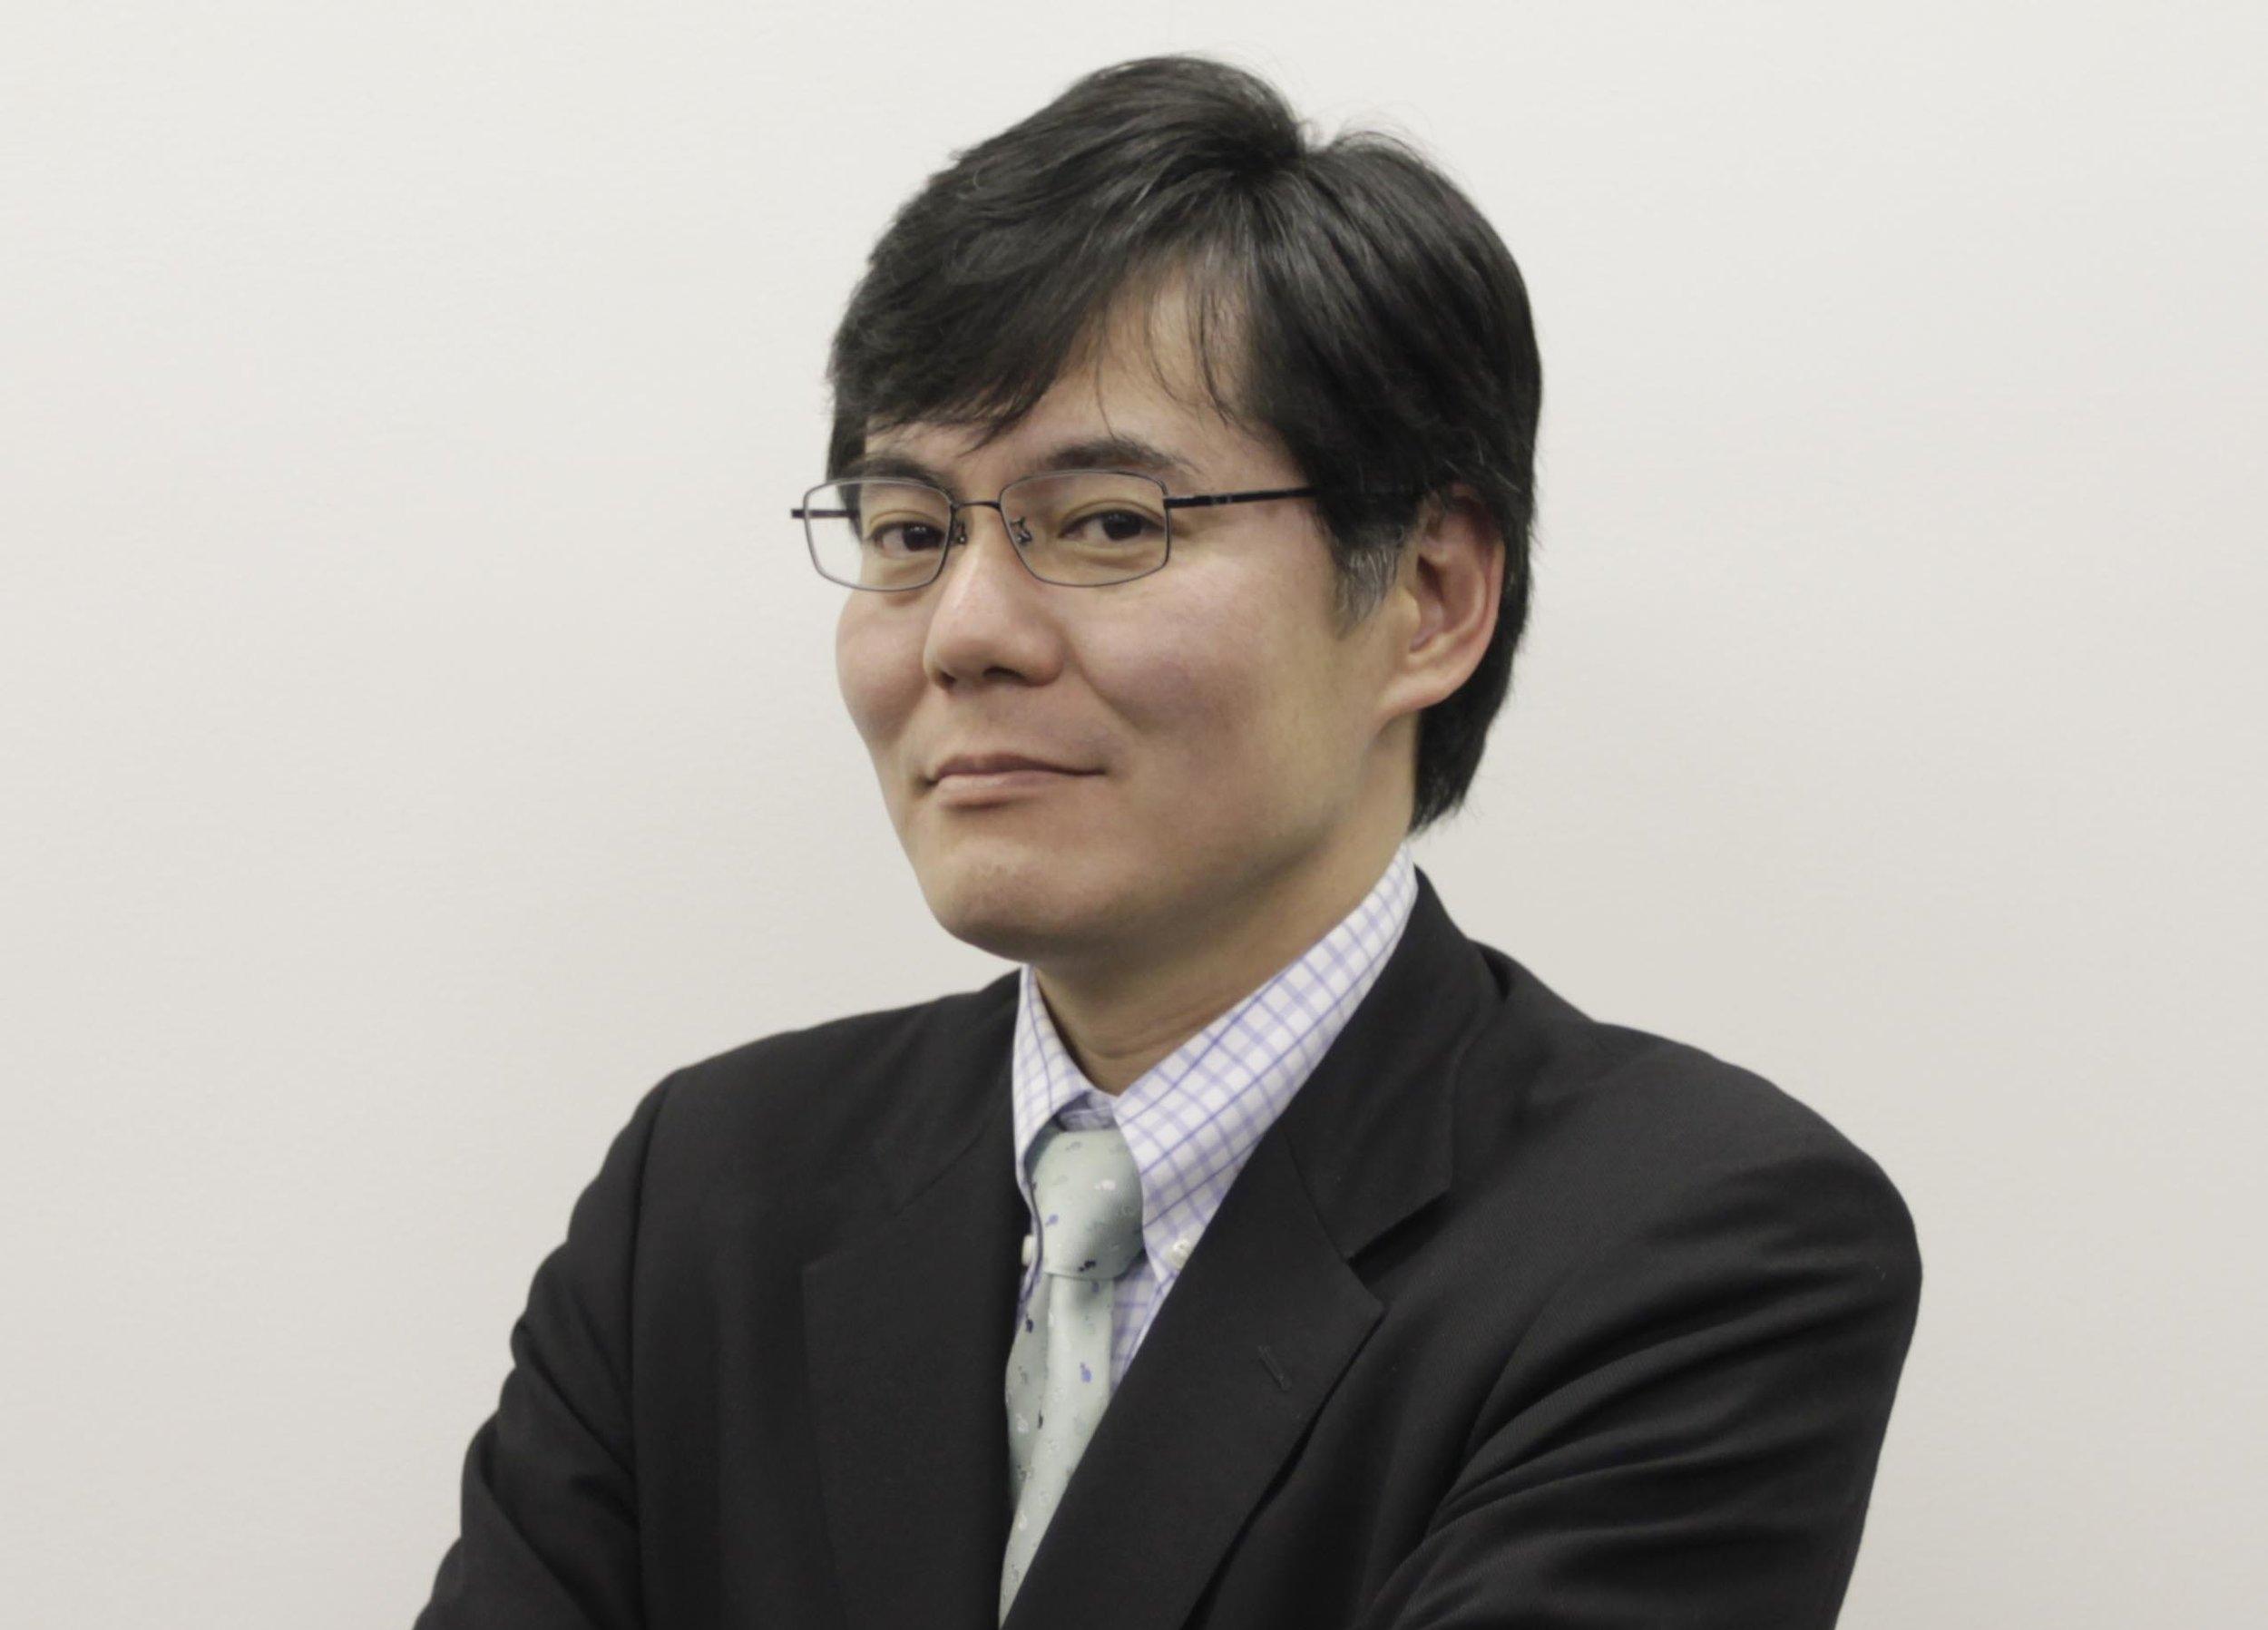 Hisanori Ogawa - Mitzuo-Securities, Japan